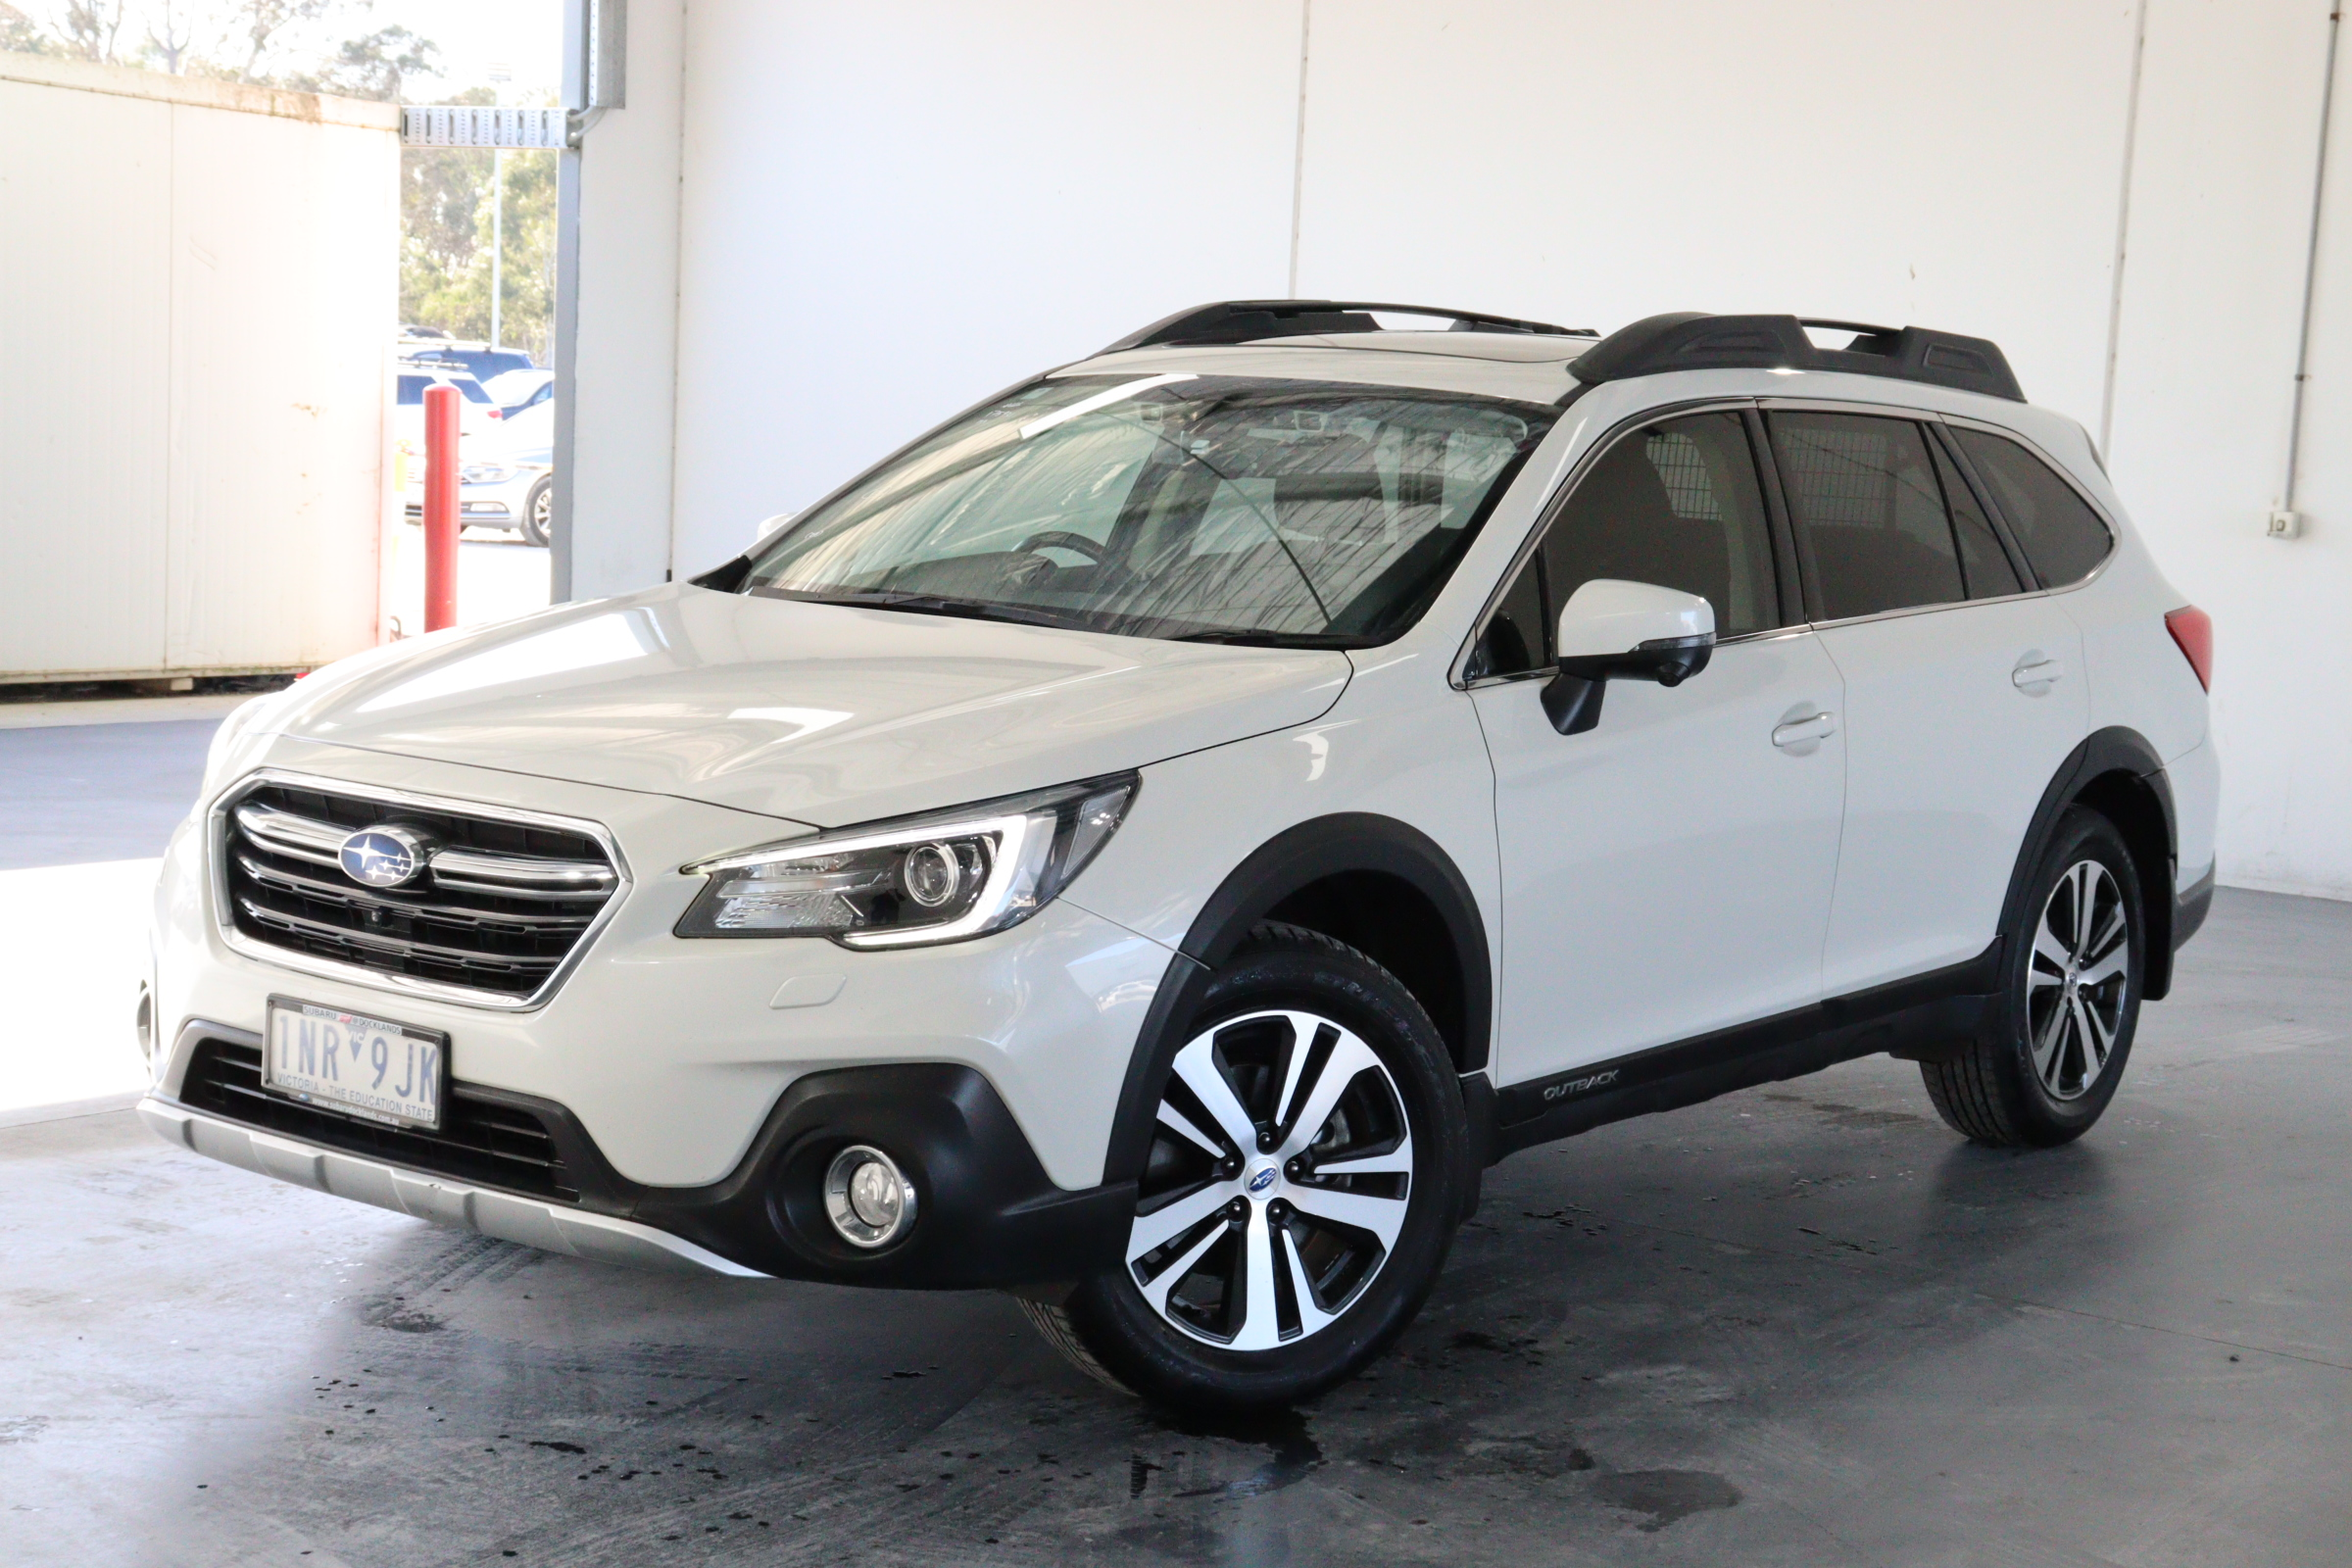 2018 Subaru Outback 2.5i Premium B6A CVT Wagon